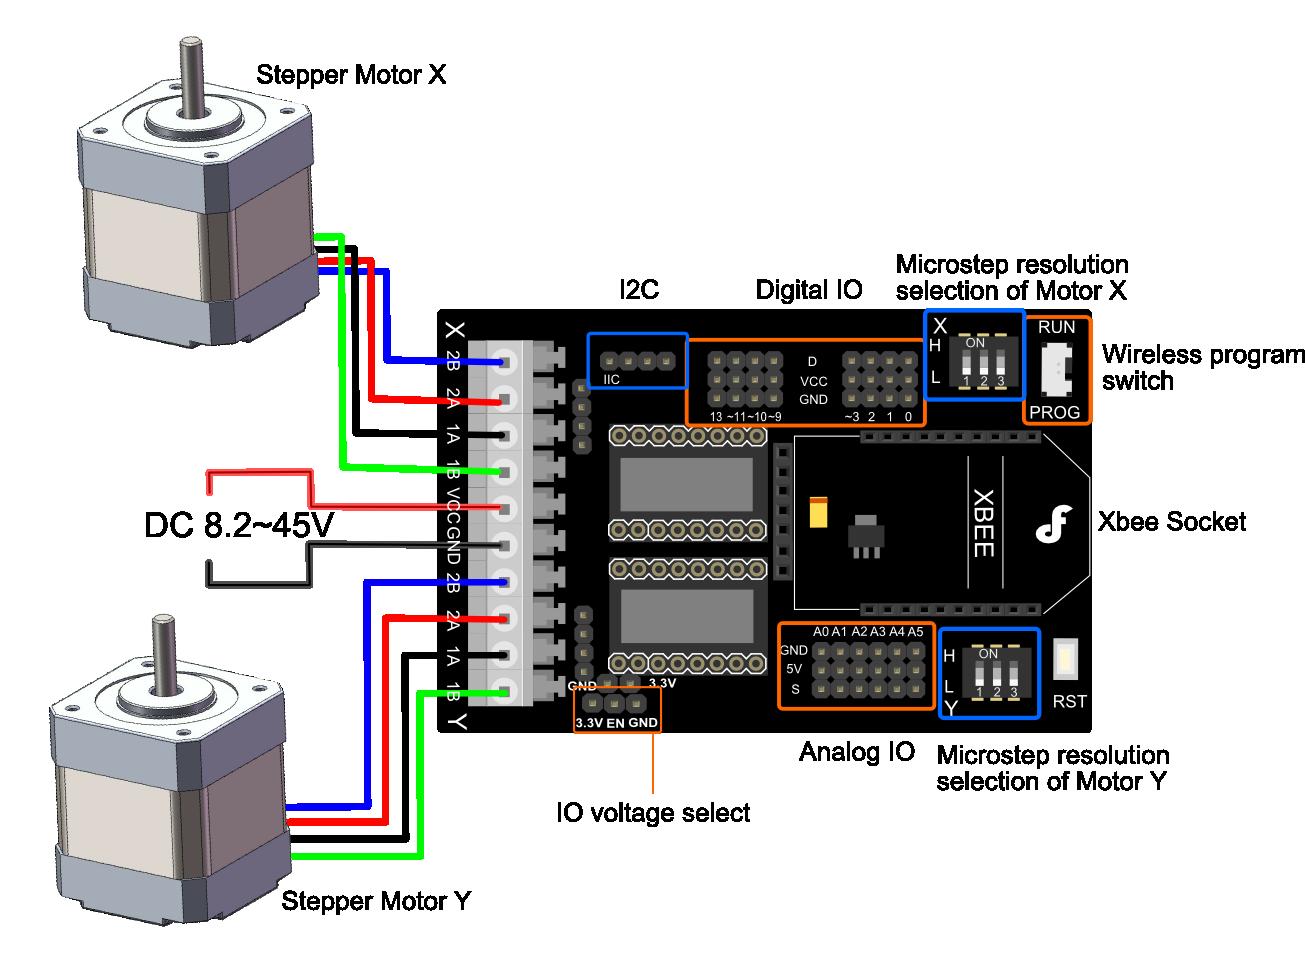 Dri0023 drv8825 layout osdyxhki3n